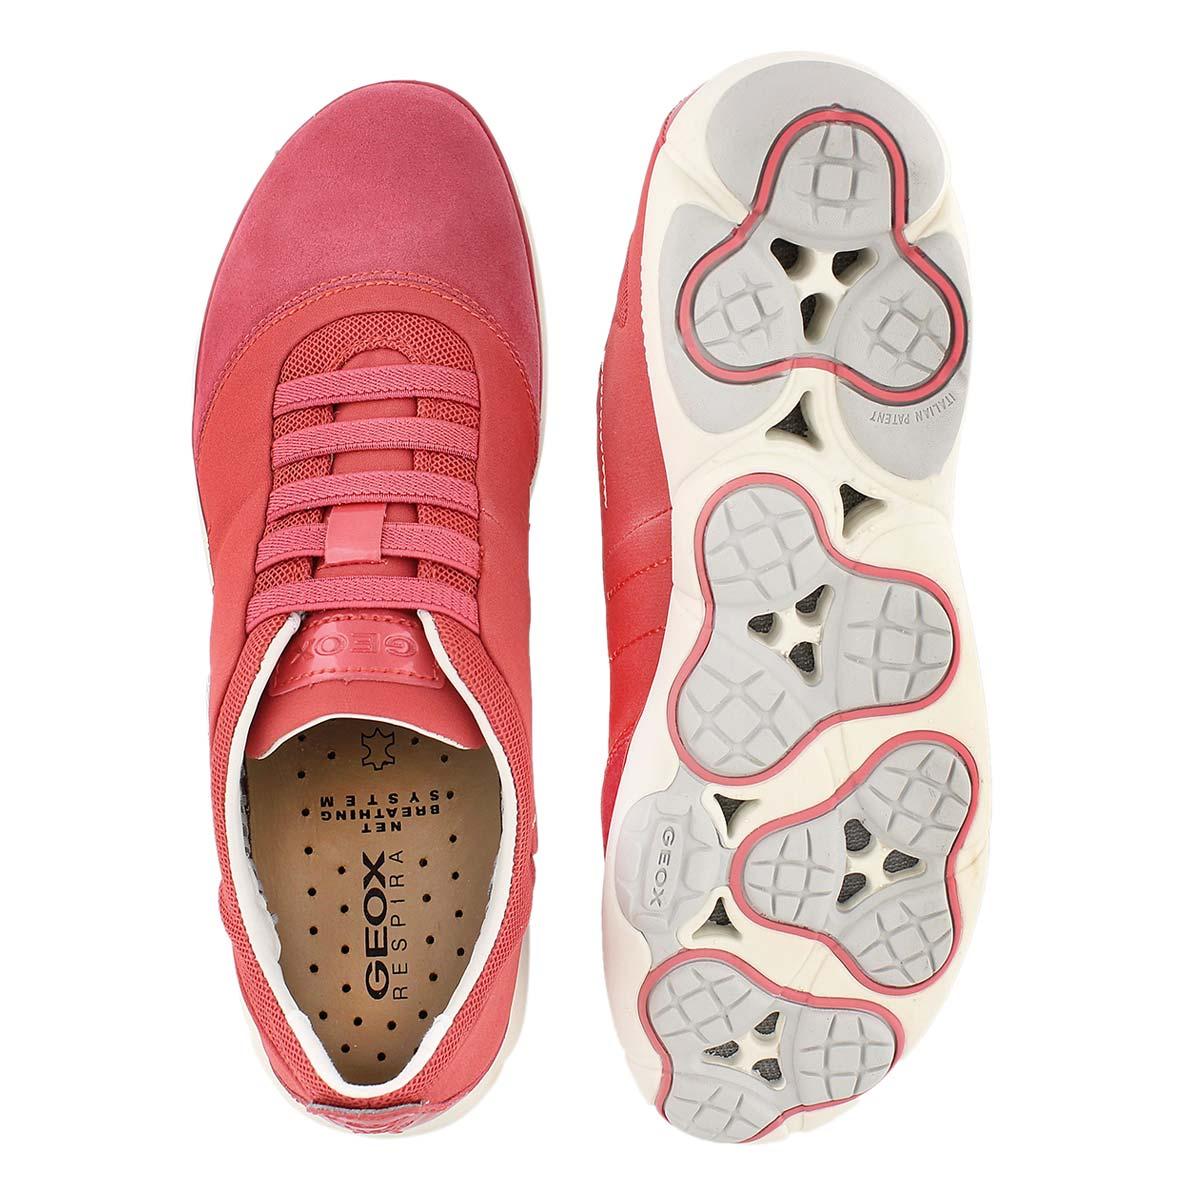 Lds Nebula coral running shoe